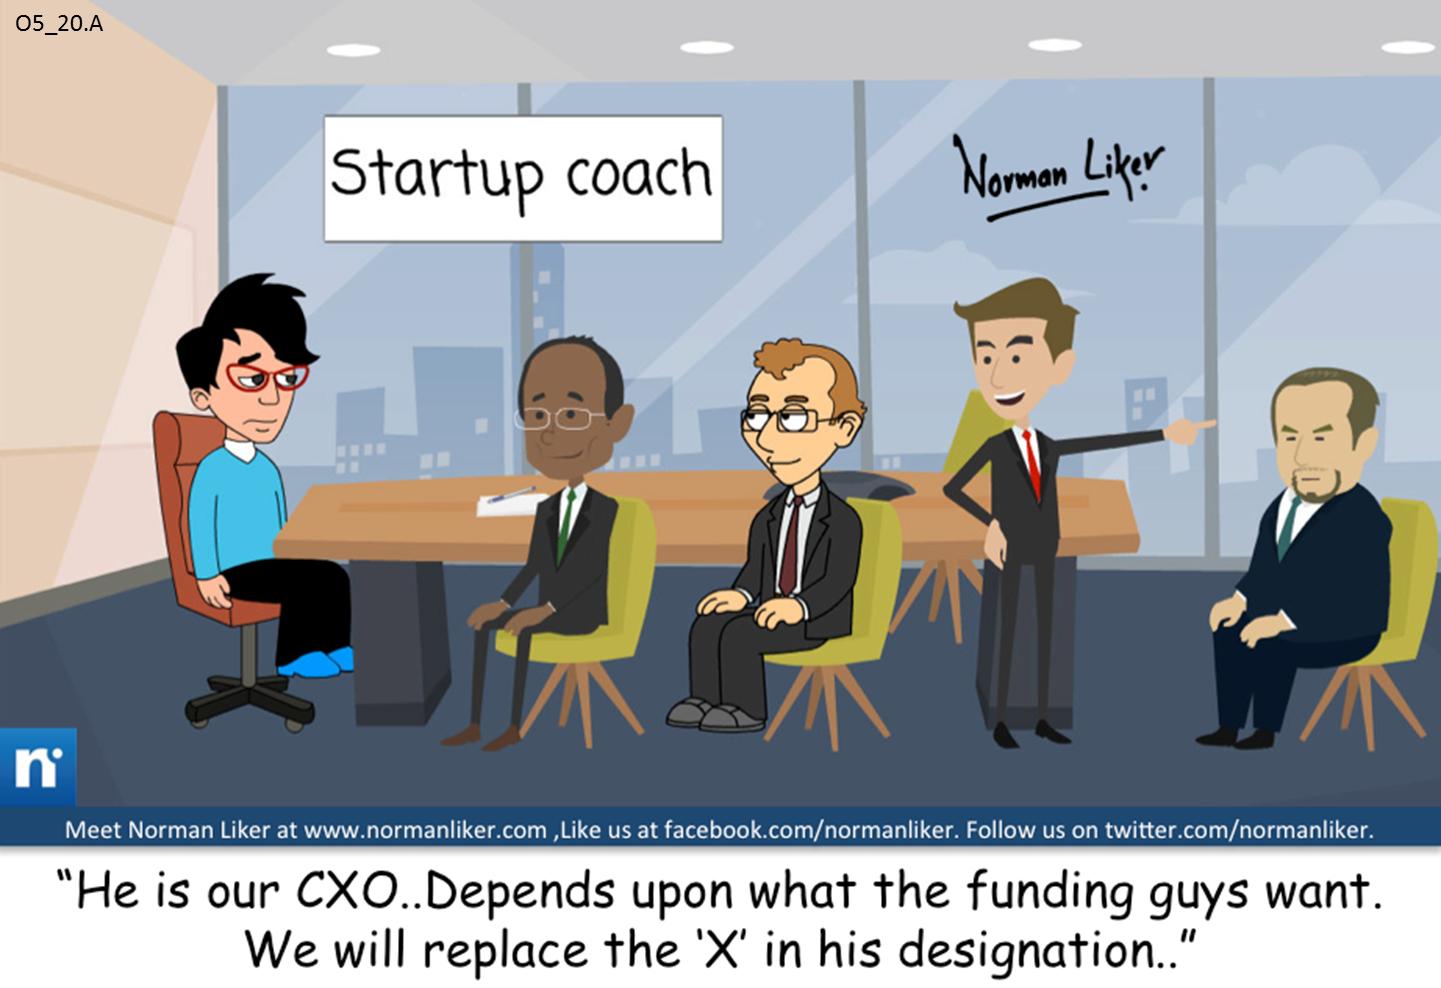 Office Comics: Startup coach